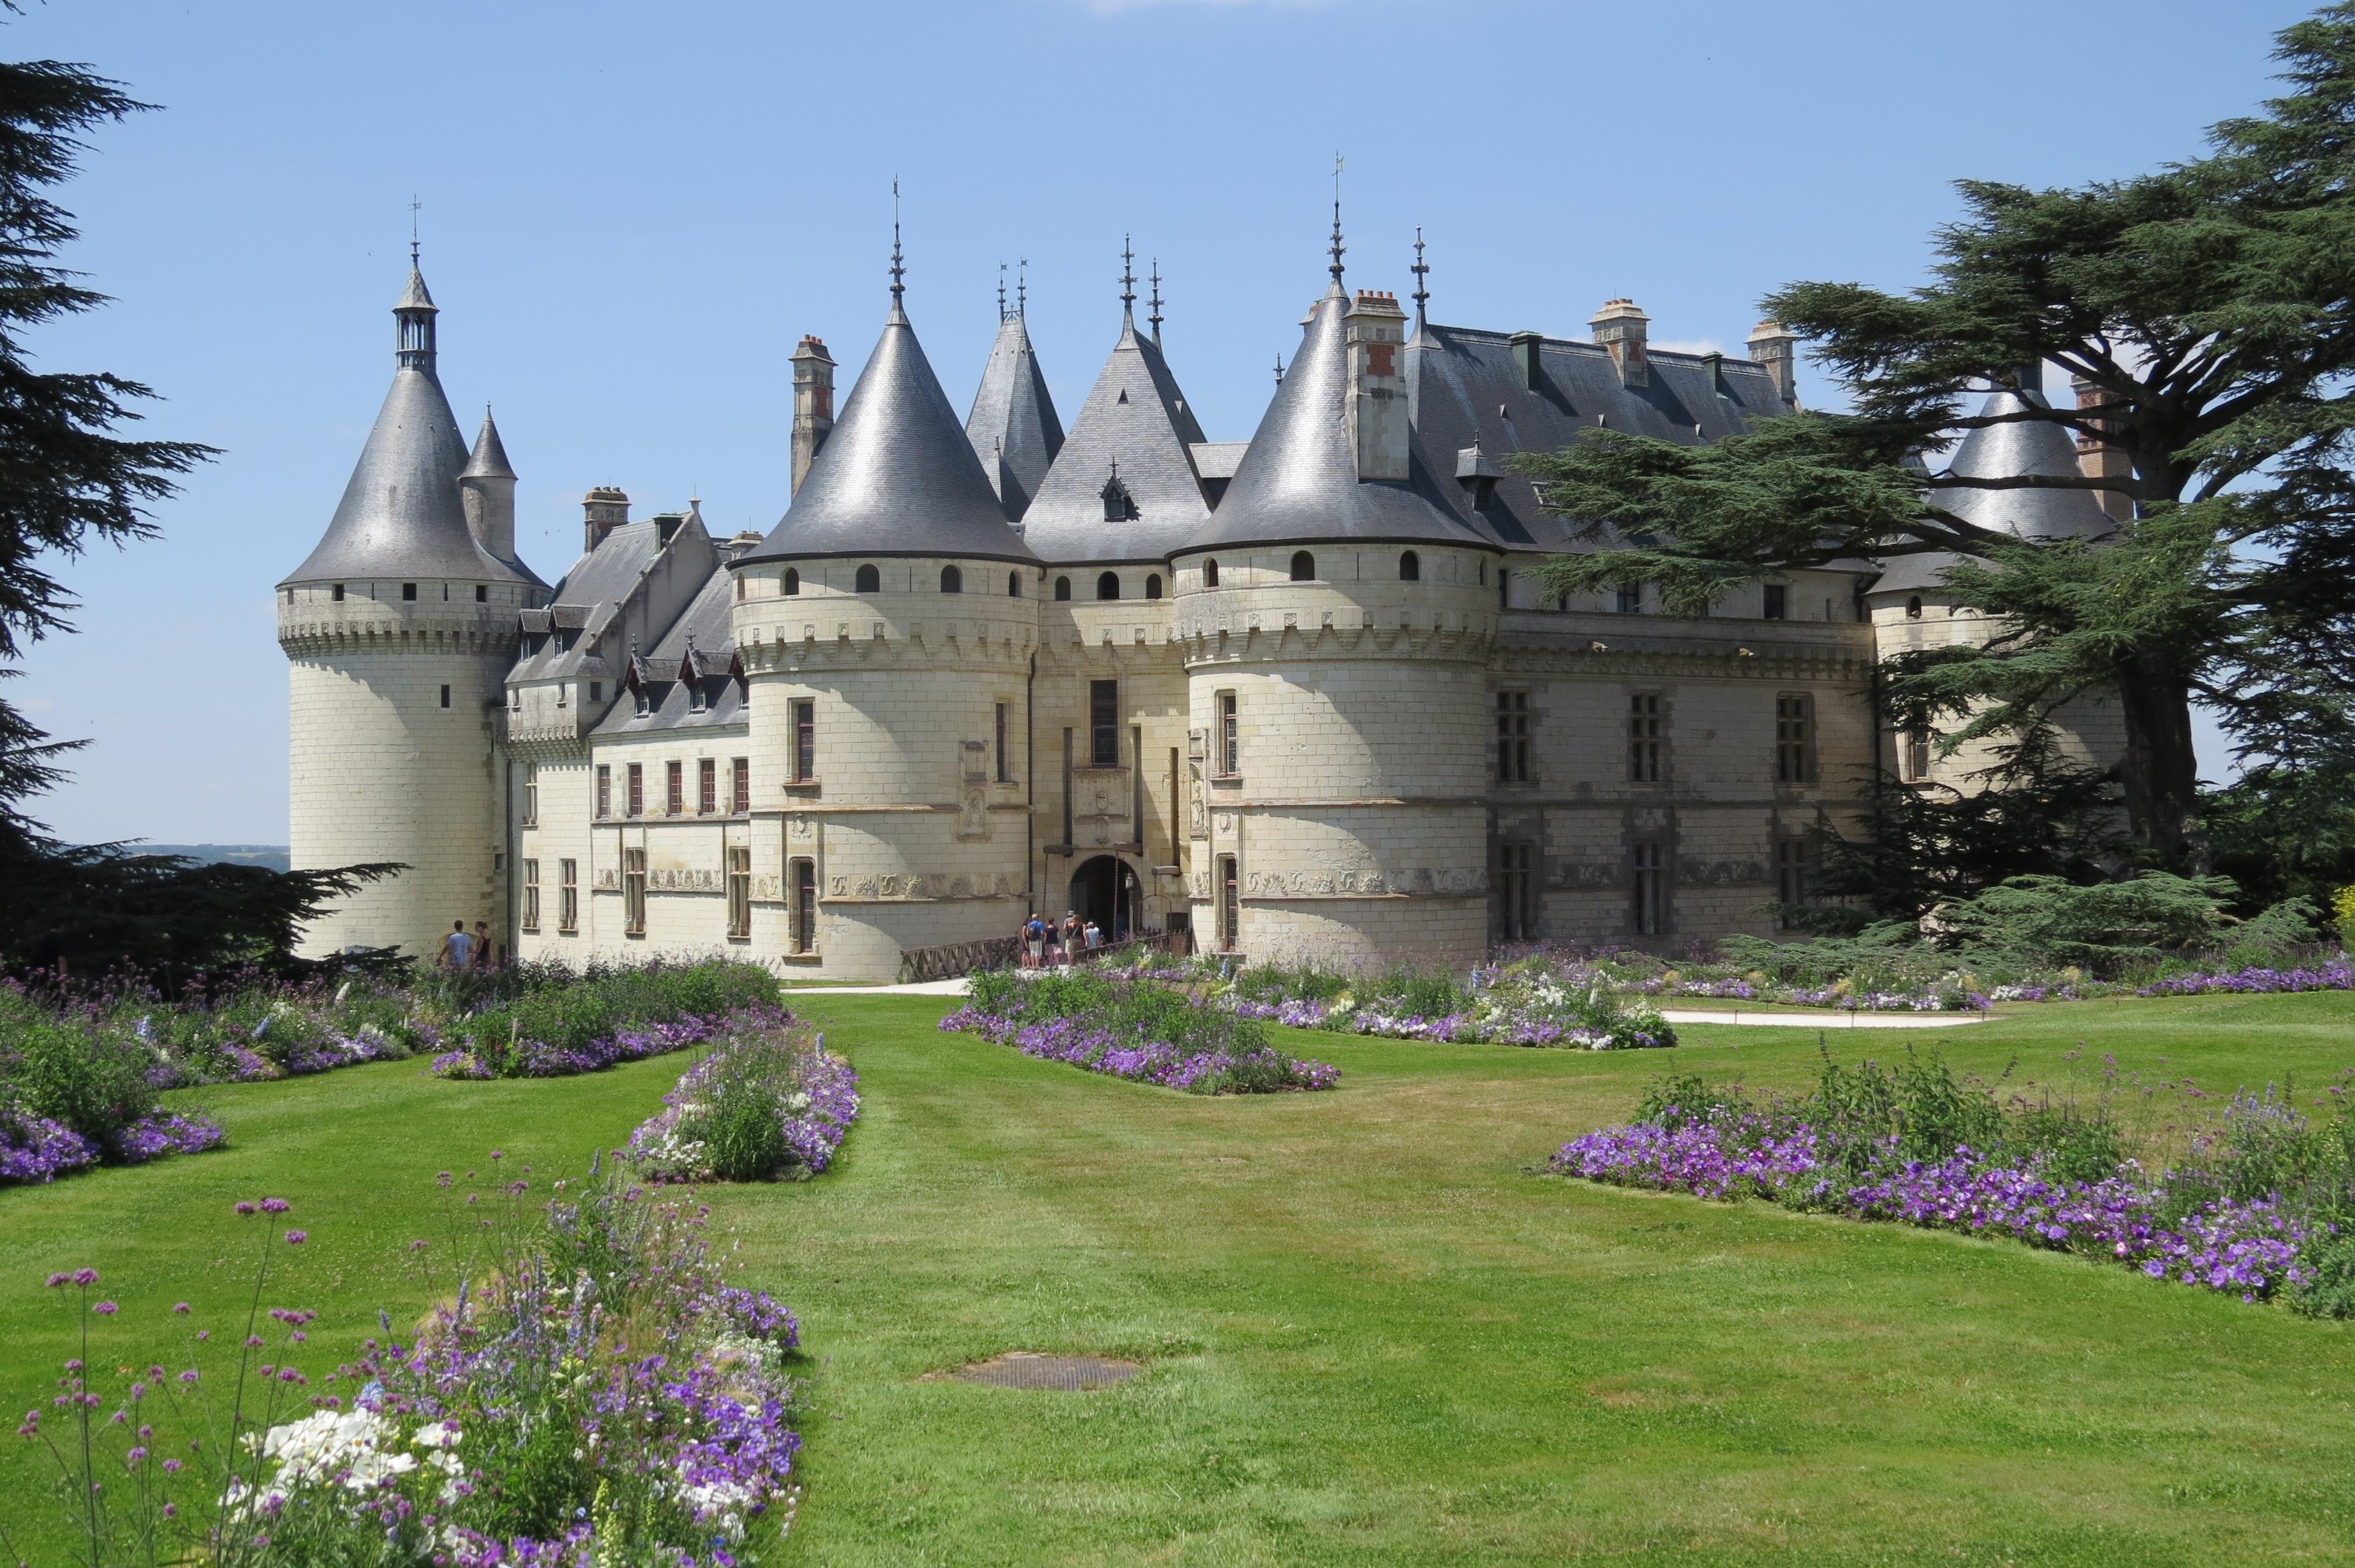 10.Chateau